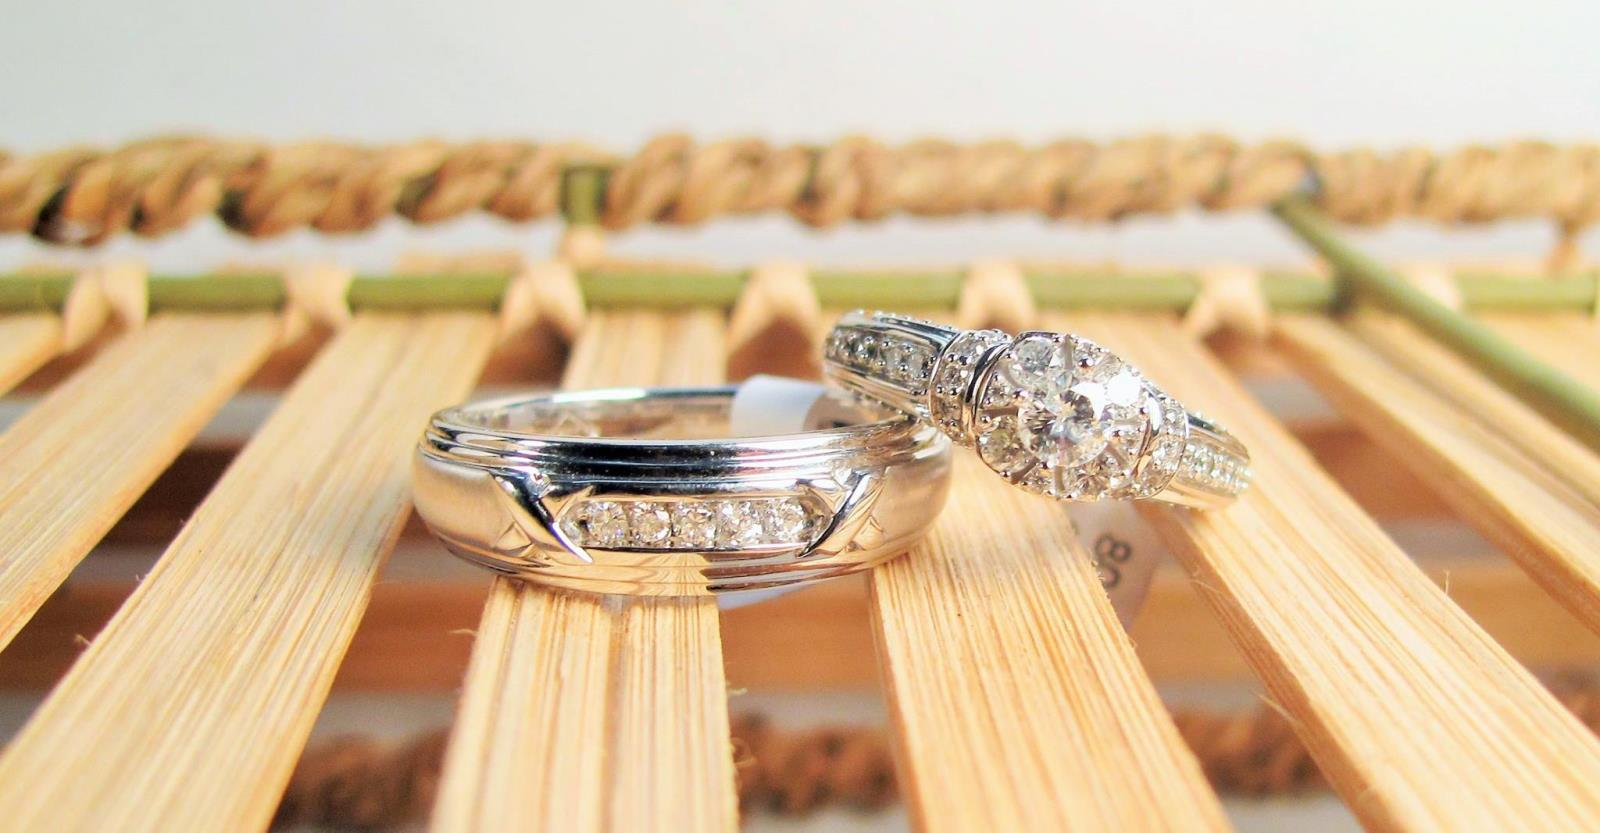 Dinkins Jewelry